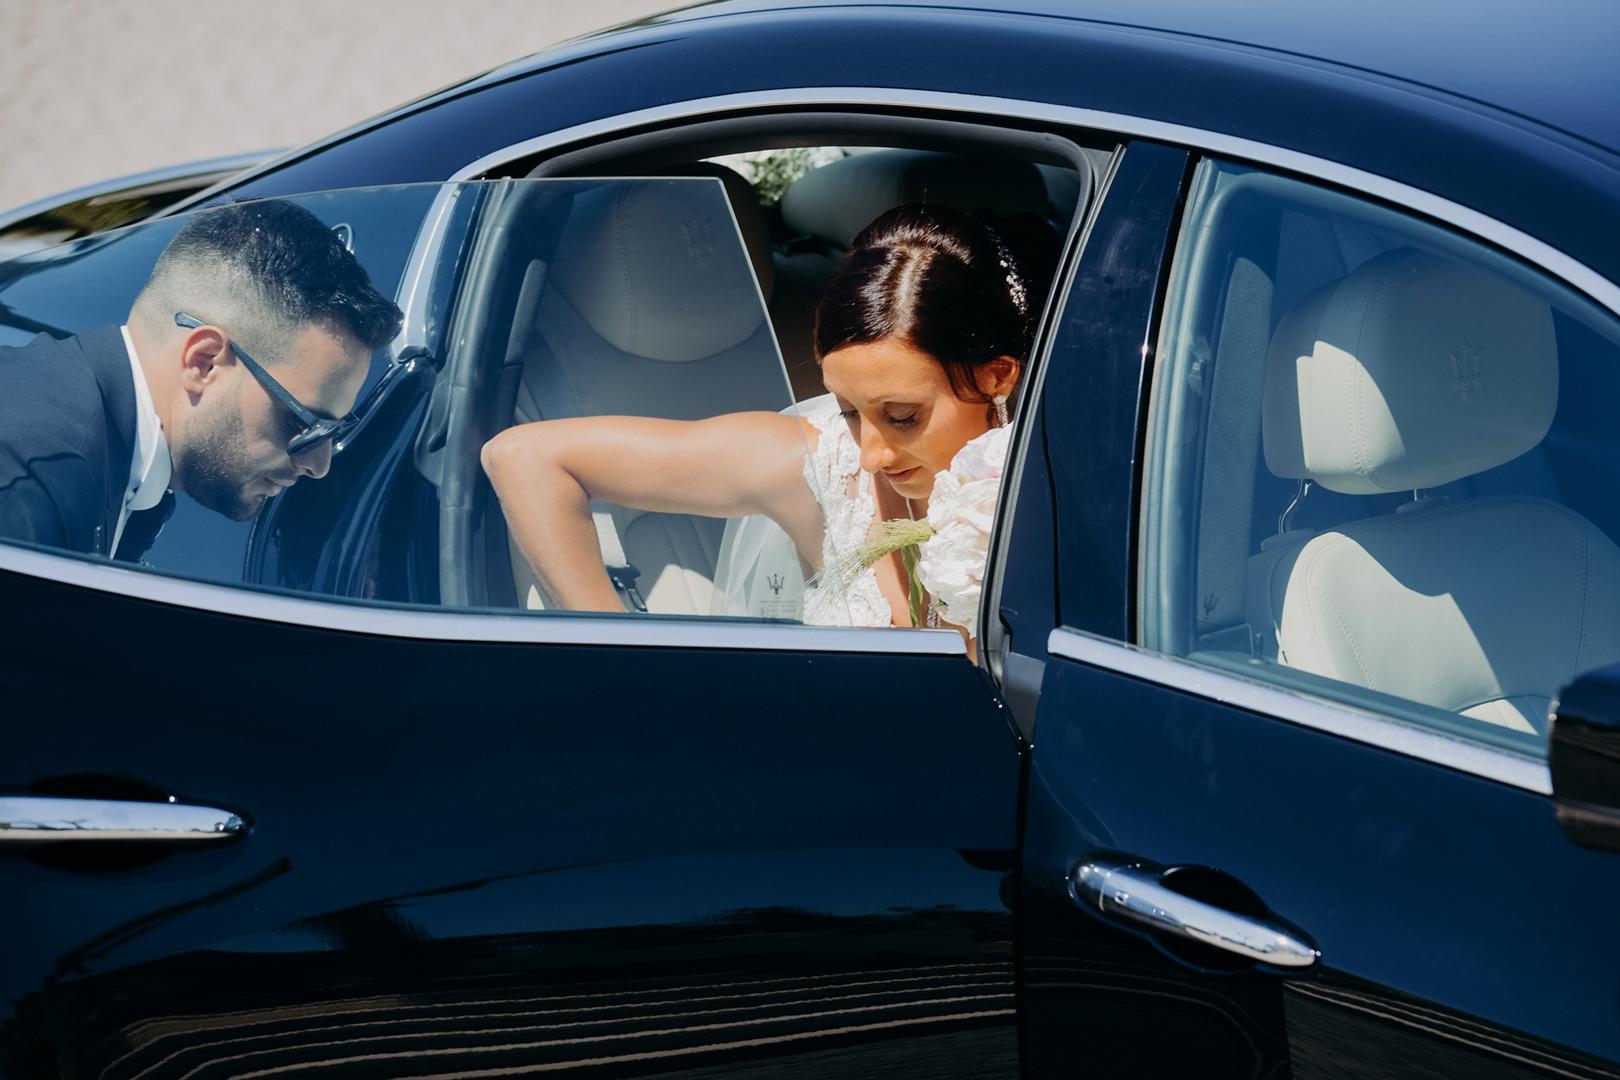 20 gianni-lepore-fotografo-auto-sposi-arrivo-sala-groom-bride